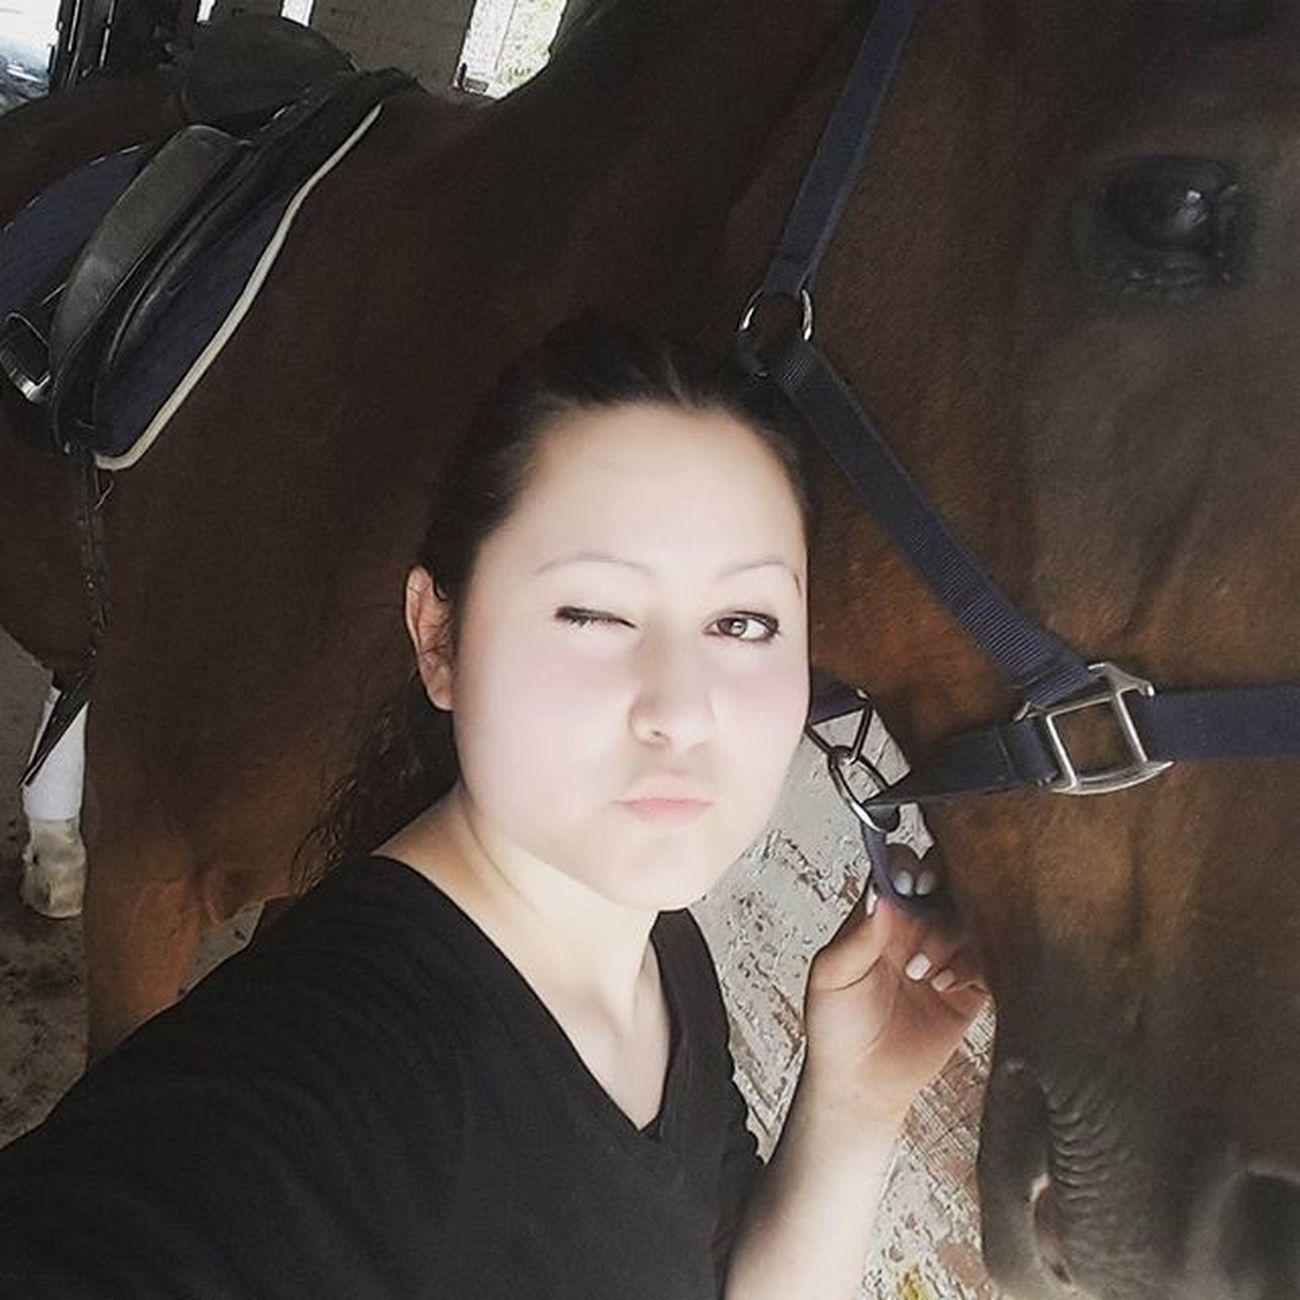 Te amo! Equinephotography Equipe Love Perfect Beautiful Instahorse Intelligent Horsestagram Binomio Passion Horseriding